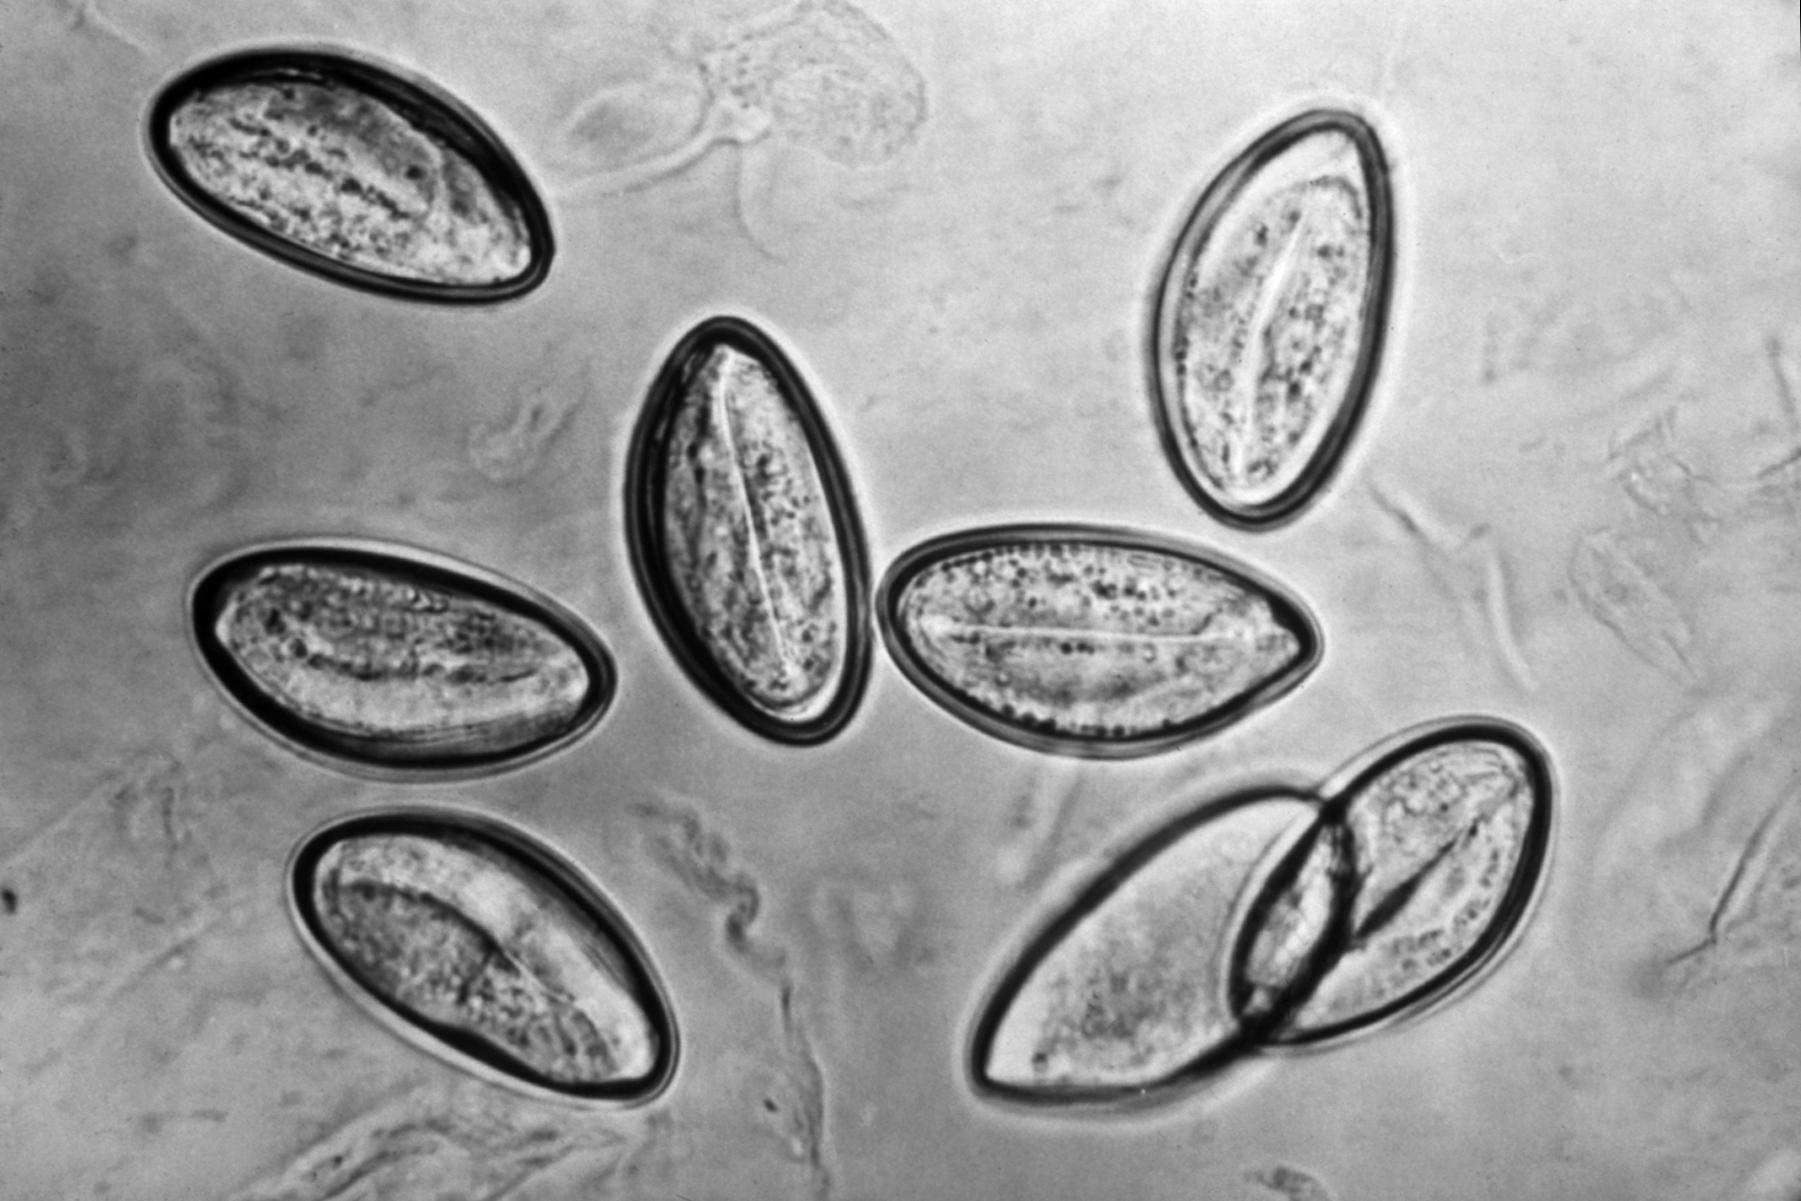 hpv oropharyngealis rák diagnózis papilloma vírus hogyan terjed